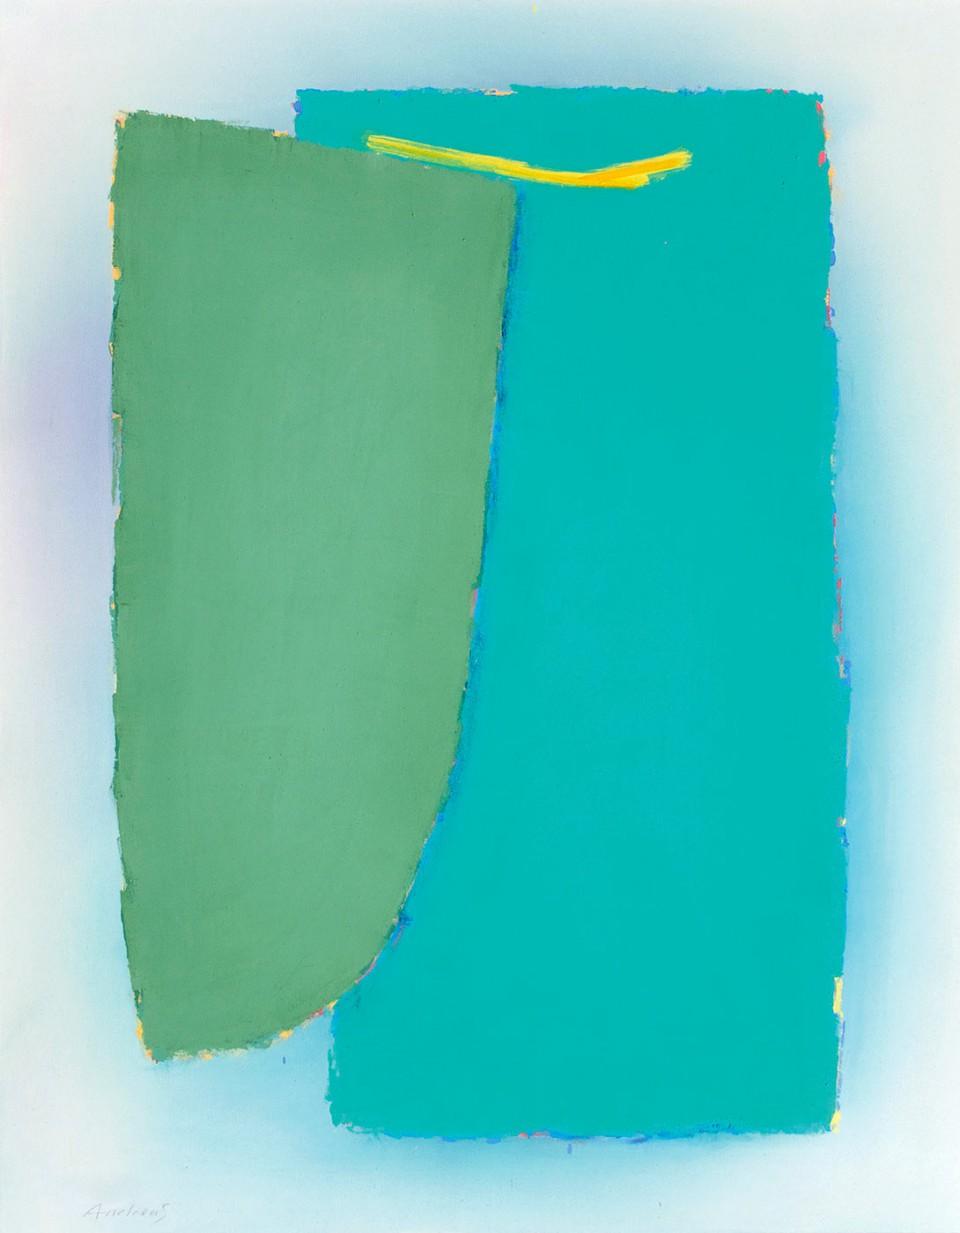 Yellow Branch (2012)  146 x 114 cm.